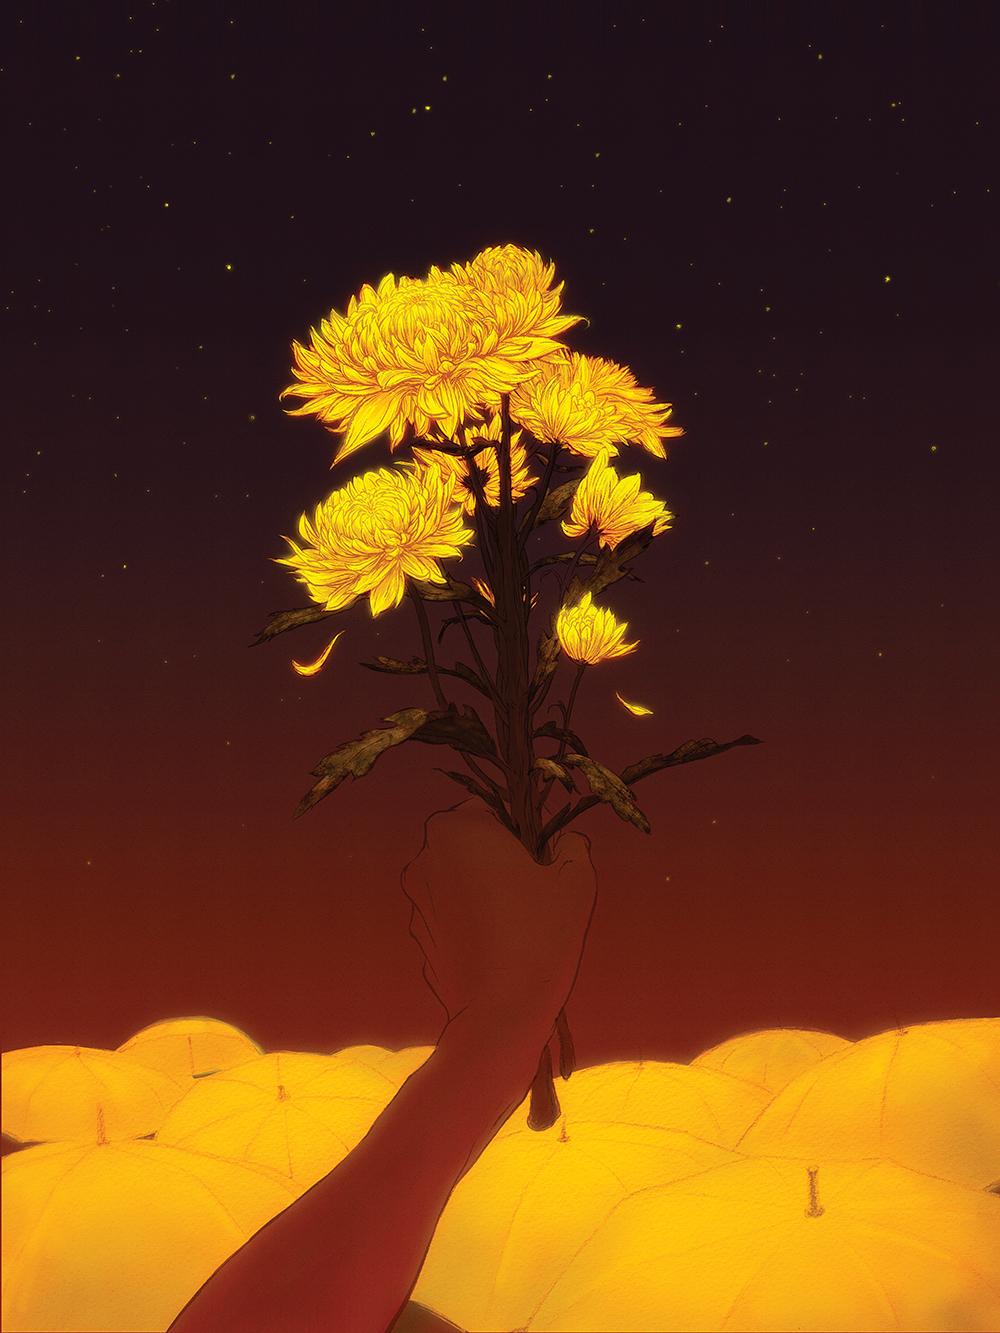 """Light in the Darkness"" by Charis Loke"